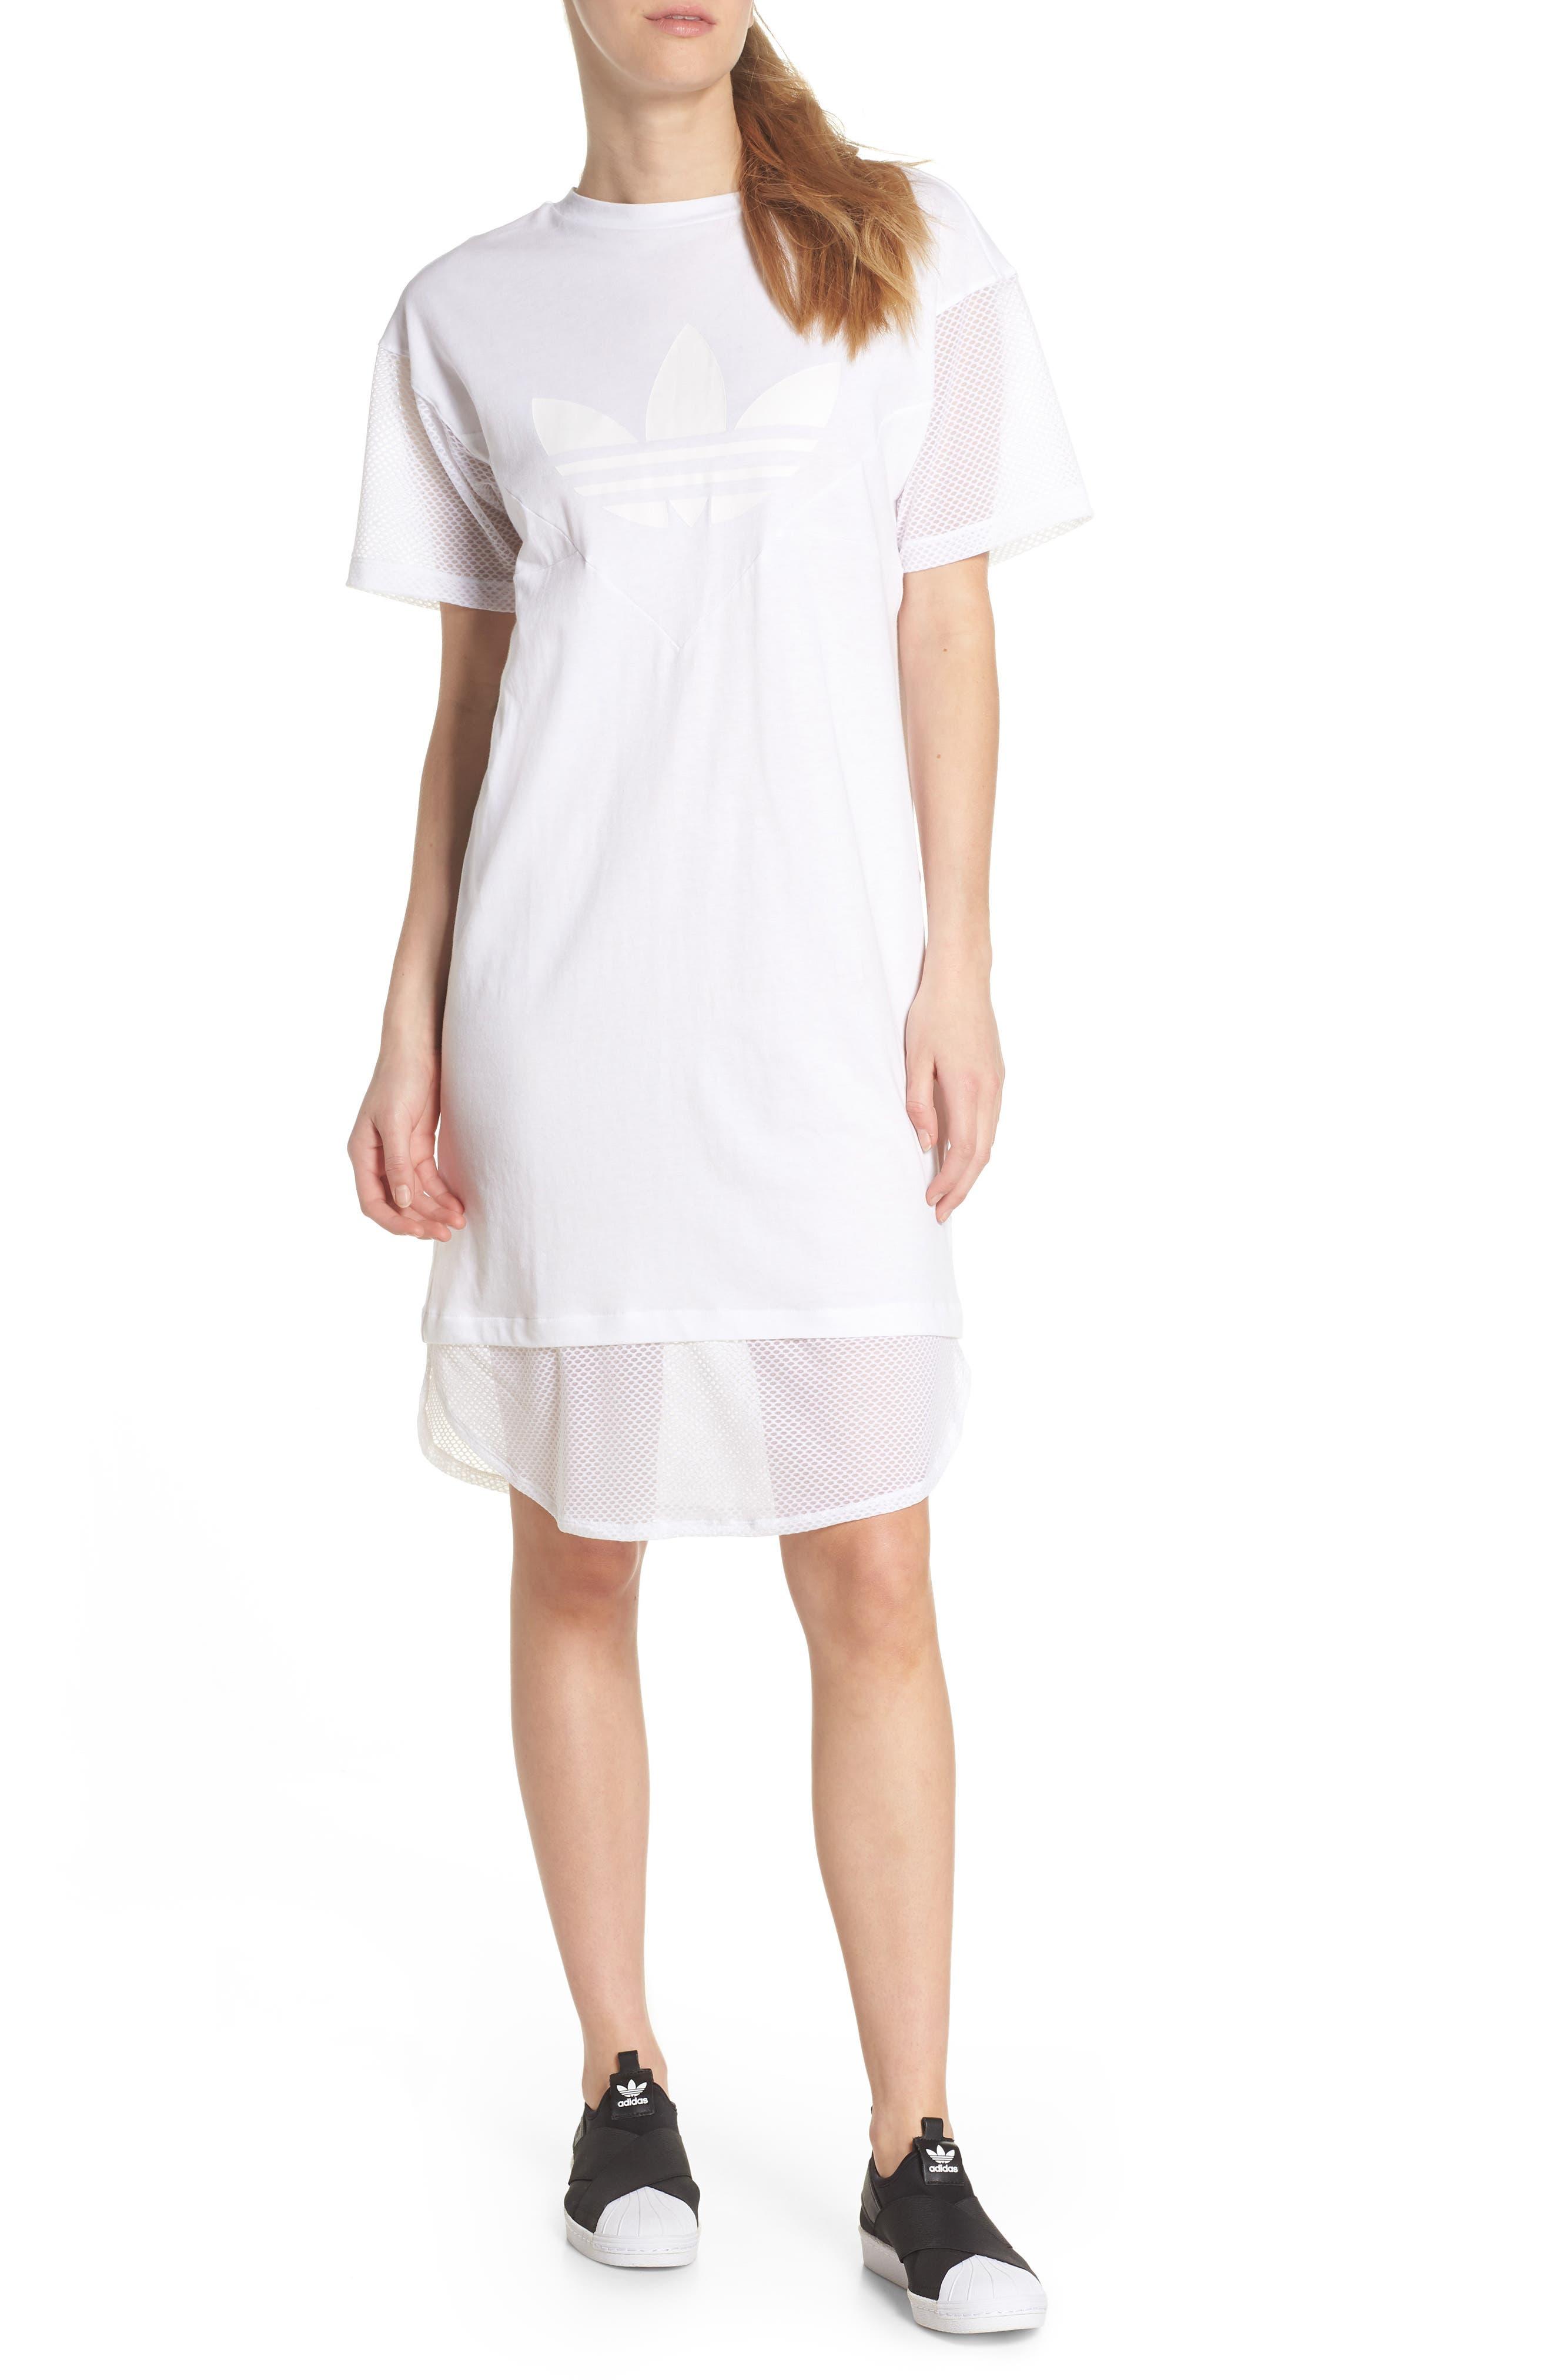 CLRDO T-Shirt Dress,                             Main thumbnail 1, color,                             100